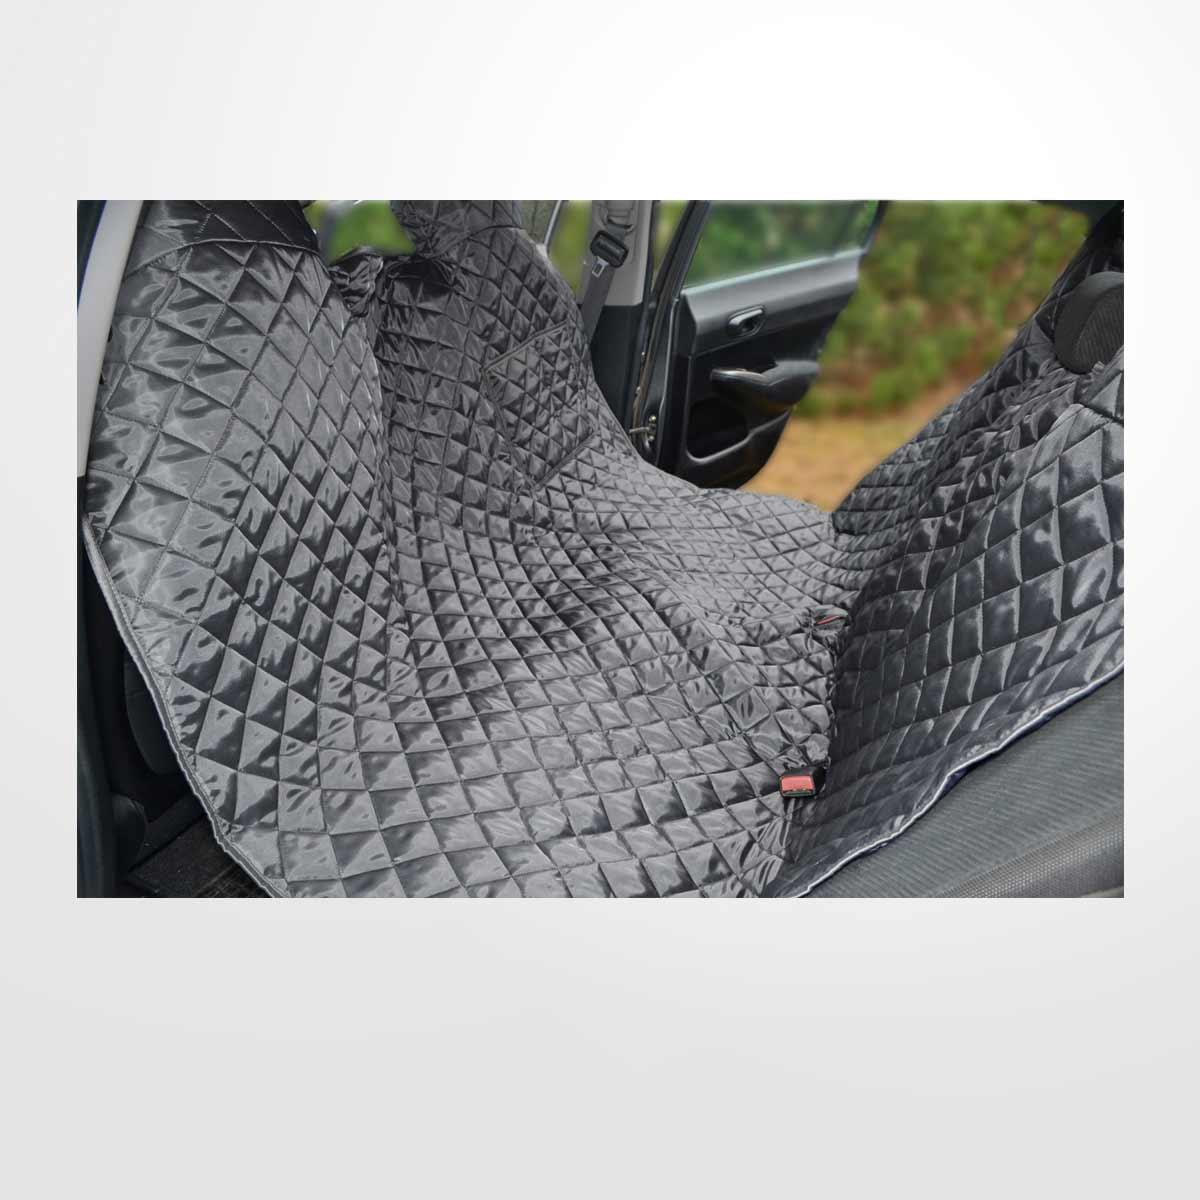 joodog CARGO-SEAT-RS Diamond | Polyester-Raute, Orthopädische Hundematte, Hundebetten Grosshandel, Wholesale. Hunde-Autoschondecken Rücksitze